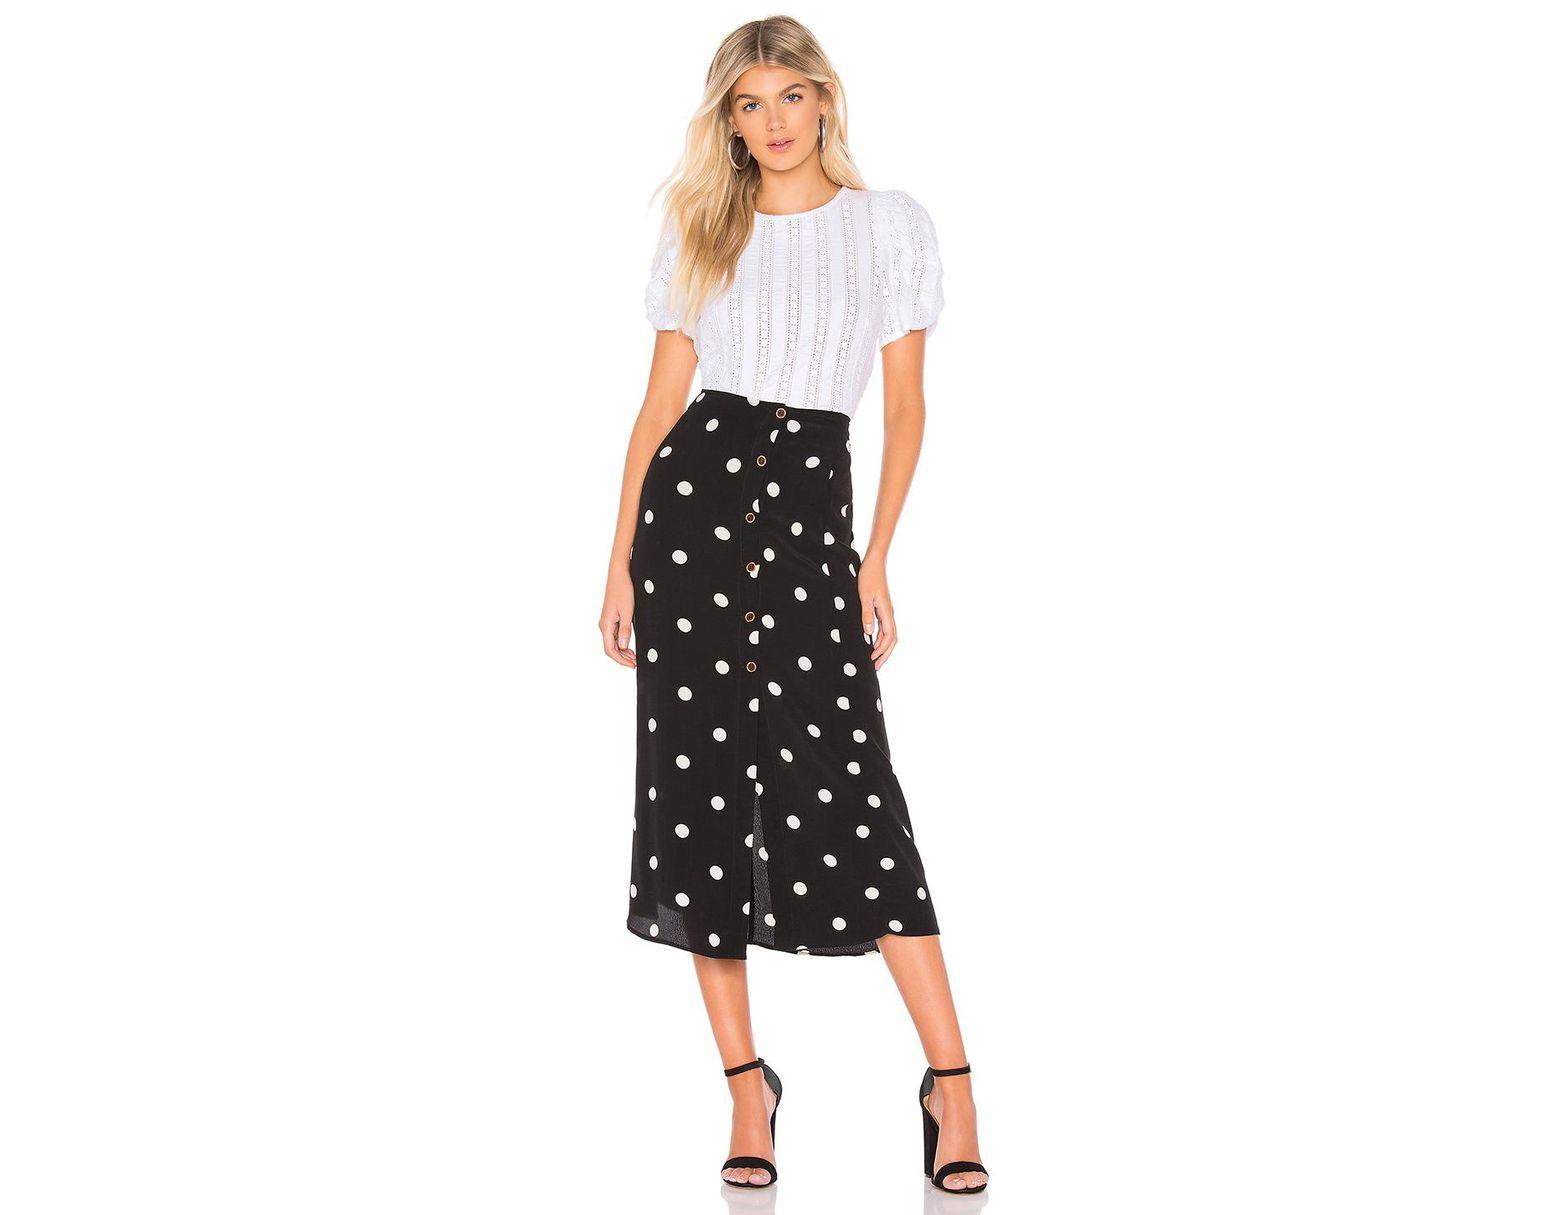 63119a8c572d6c Free People Reto Love Polka Dot Midi Skirt - Womens Uk 8 in Black - Save  50% - Lyst